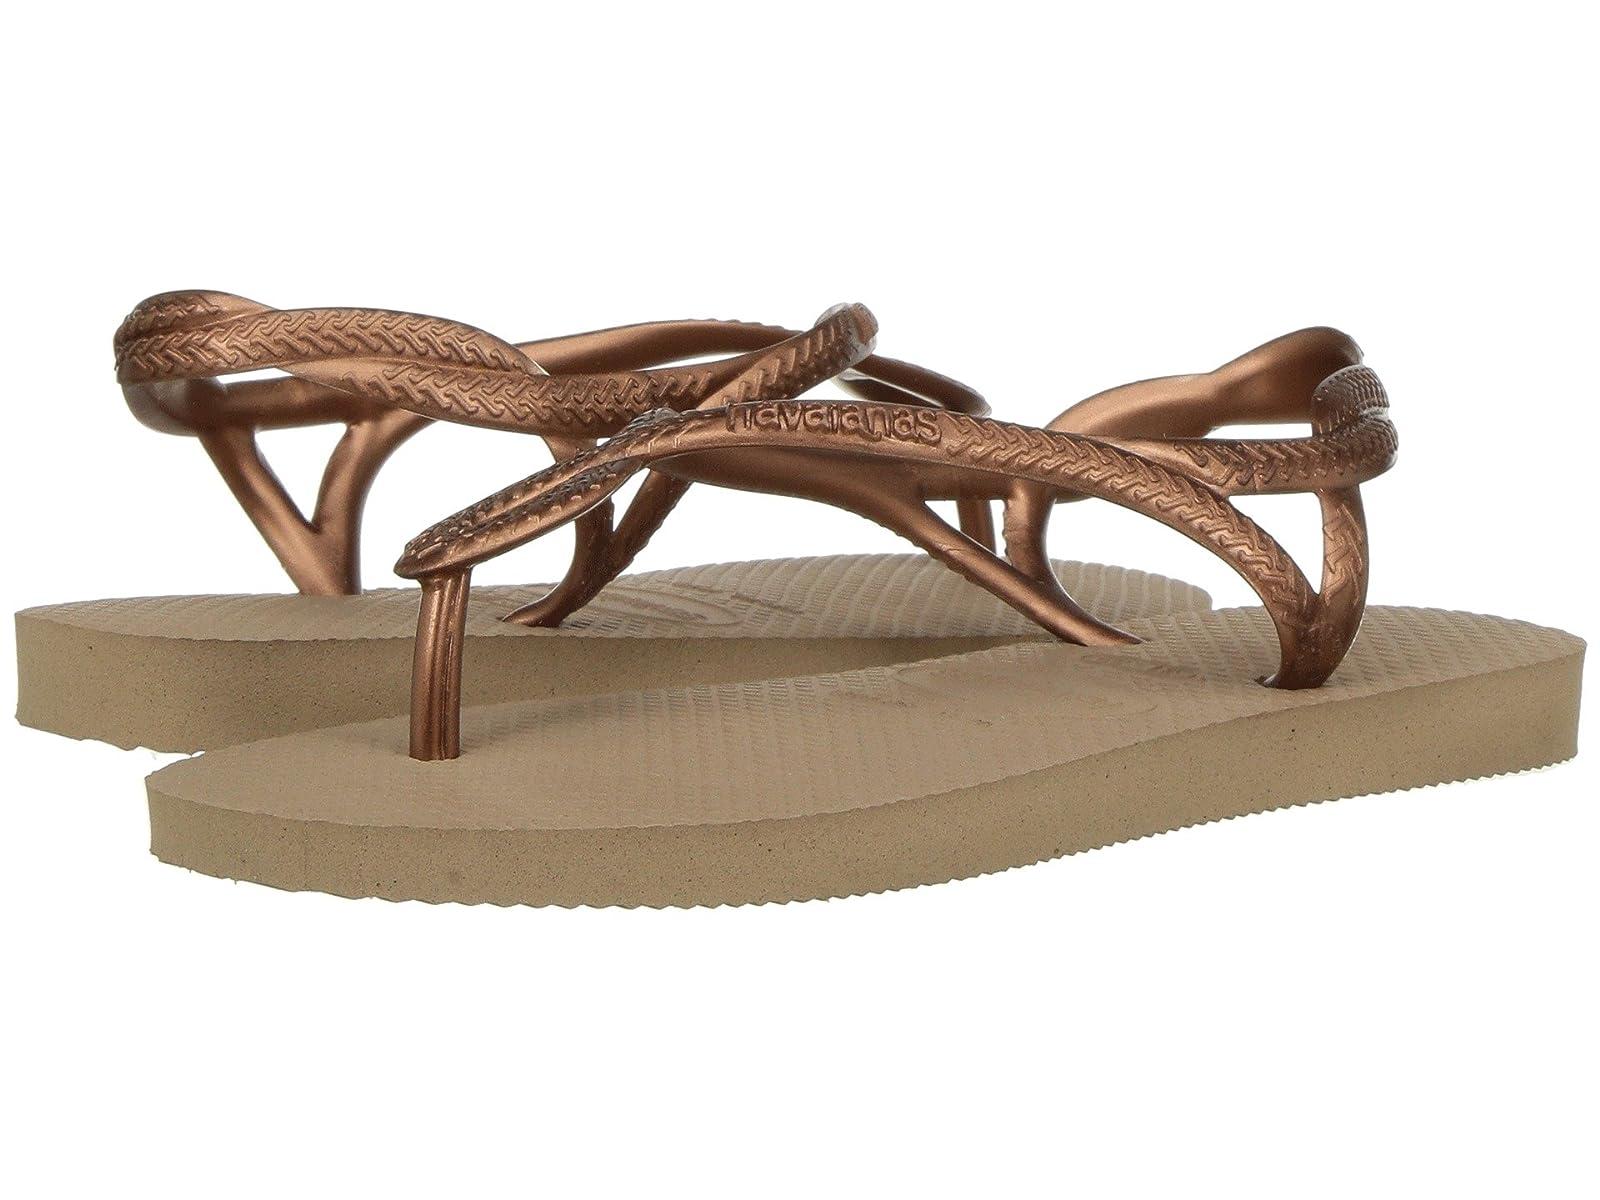 Havaianas Kids Luna Sandals (Little Kid/Big Kid)Atmospheric grades have affordable shoes